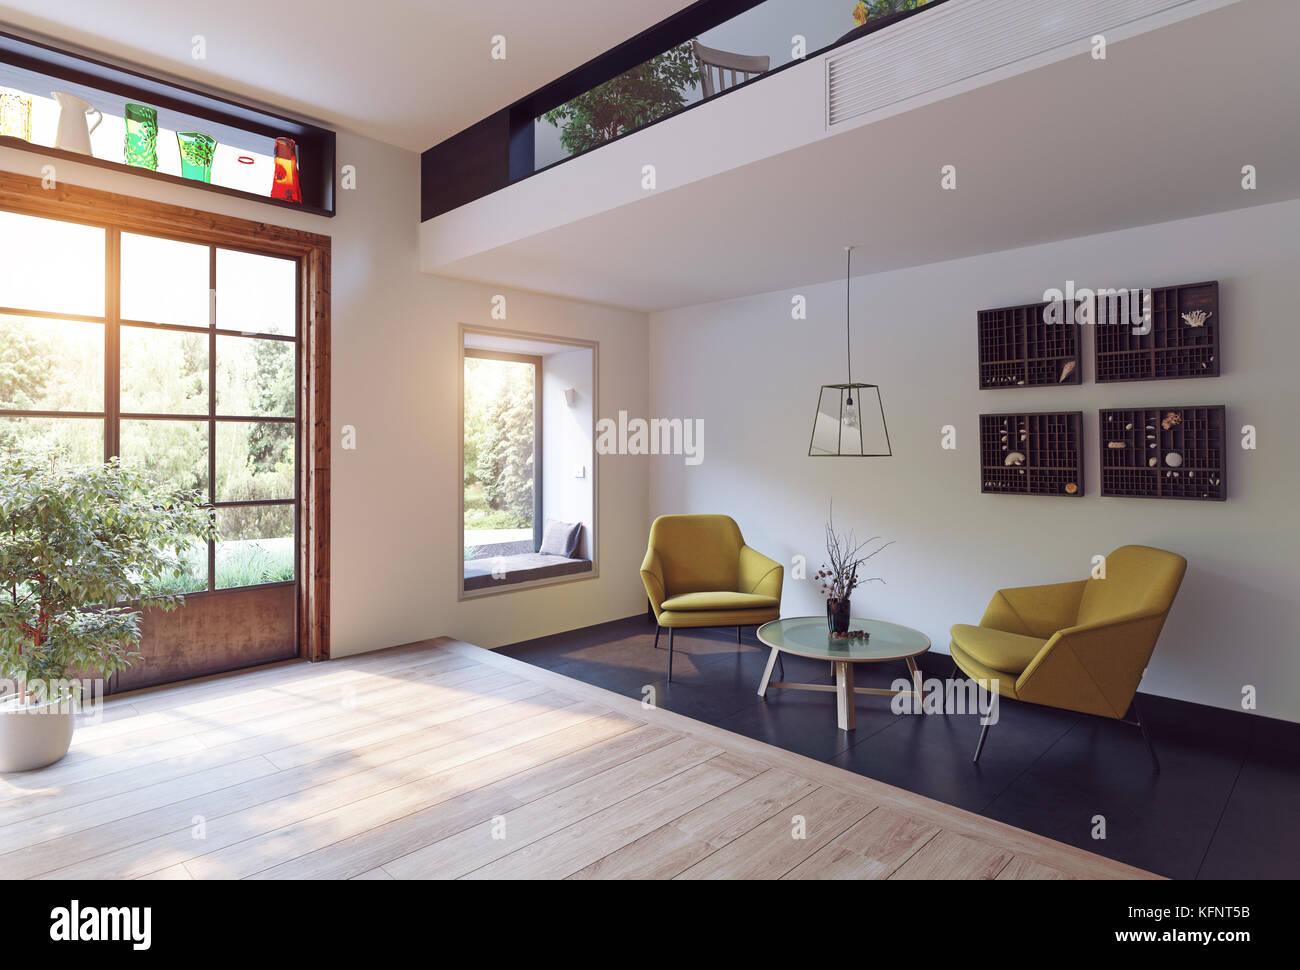 Modern interior rendering concept. 3d illustration - Stock Image